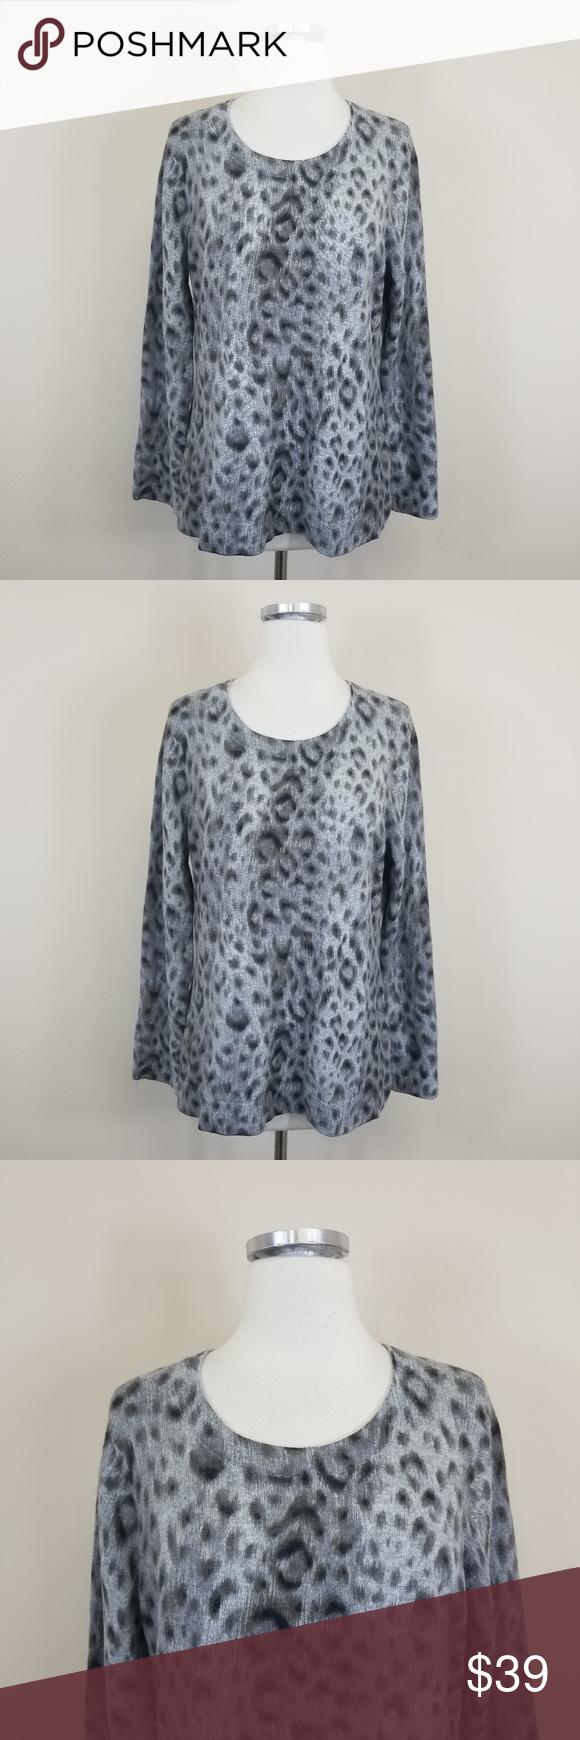 Jones New York Cashmere Leopard Animal Print XL Jones New